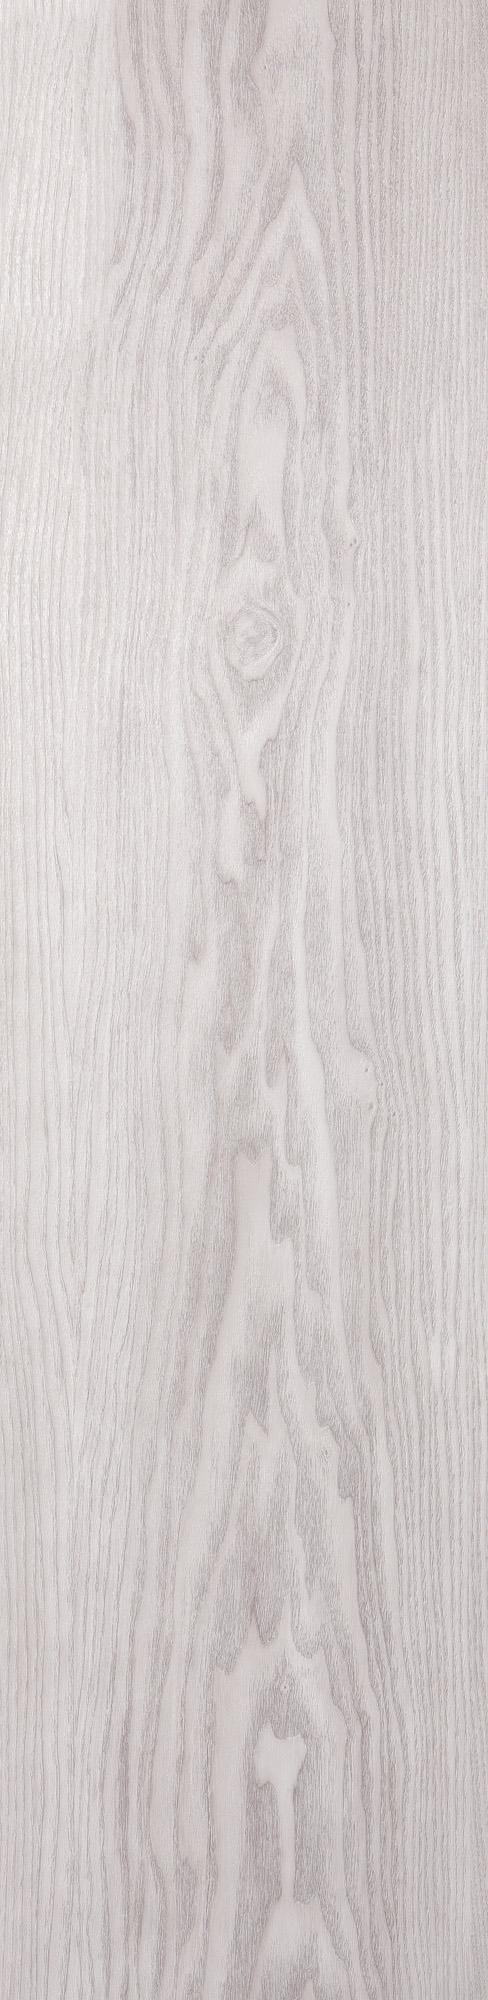 Chêne pédonculé blanc